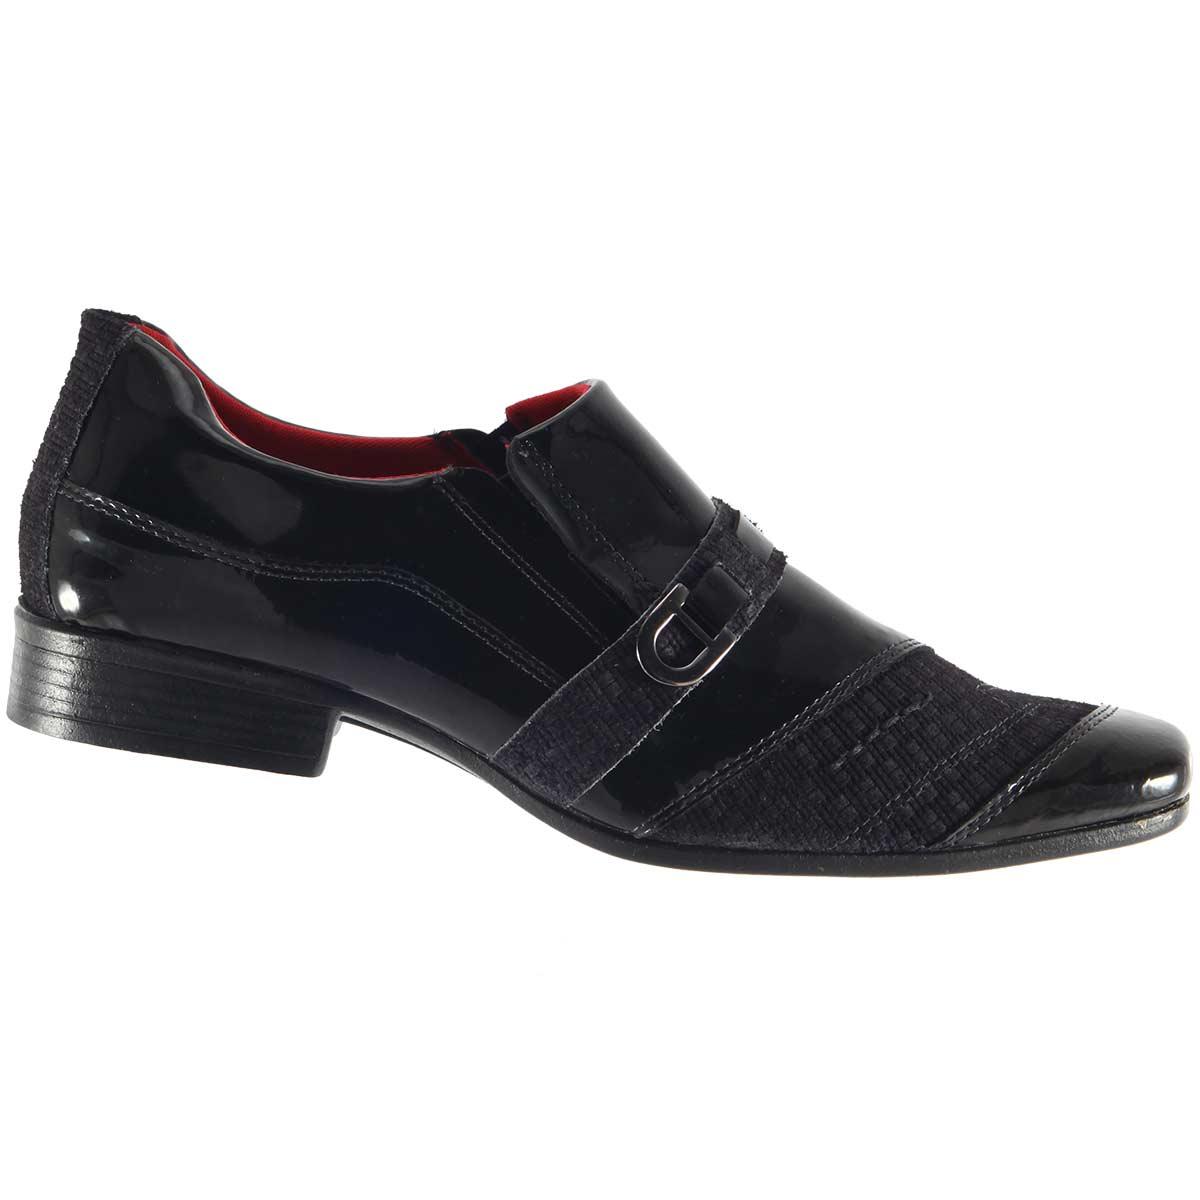 Sapato D'mazons Social Masculino Verniz AMI-502